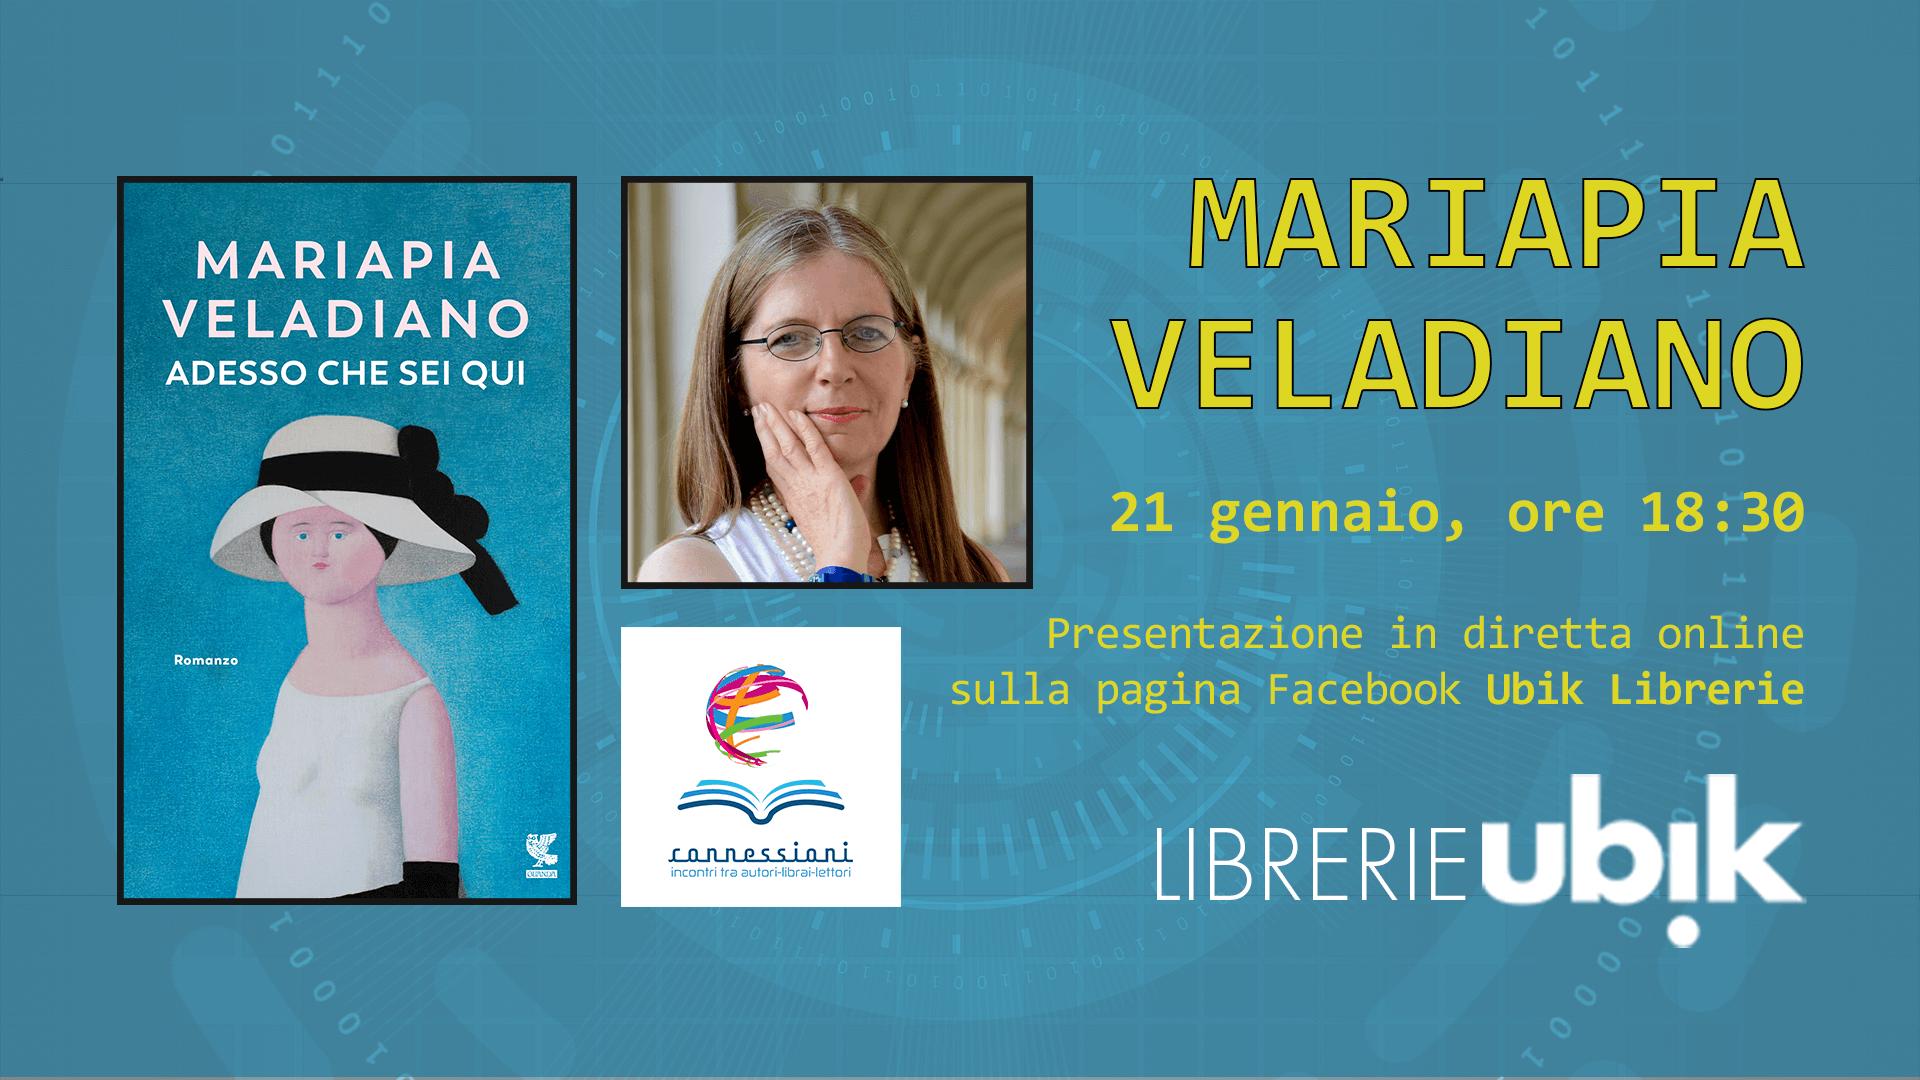 MARIAPIA VELADIANO presenta in diretta online